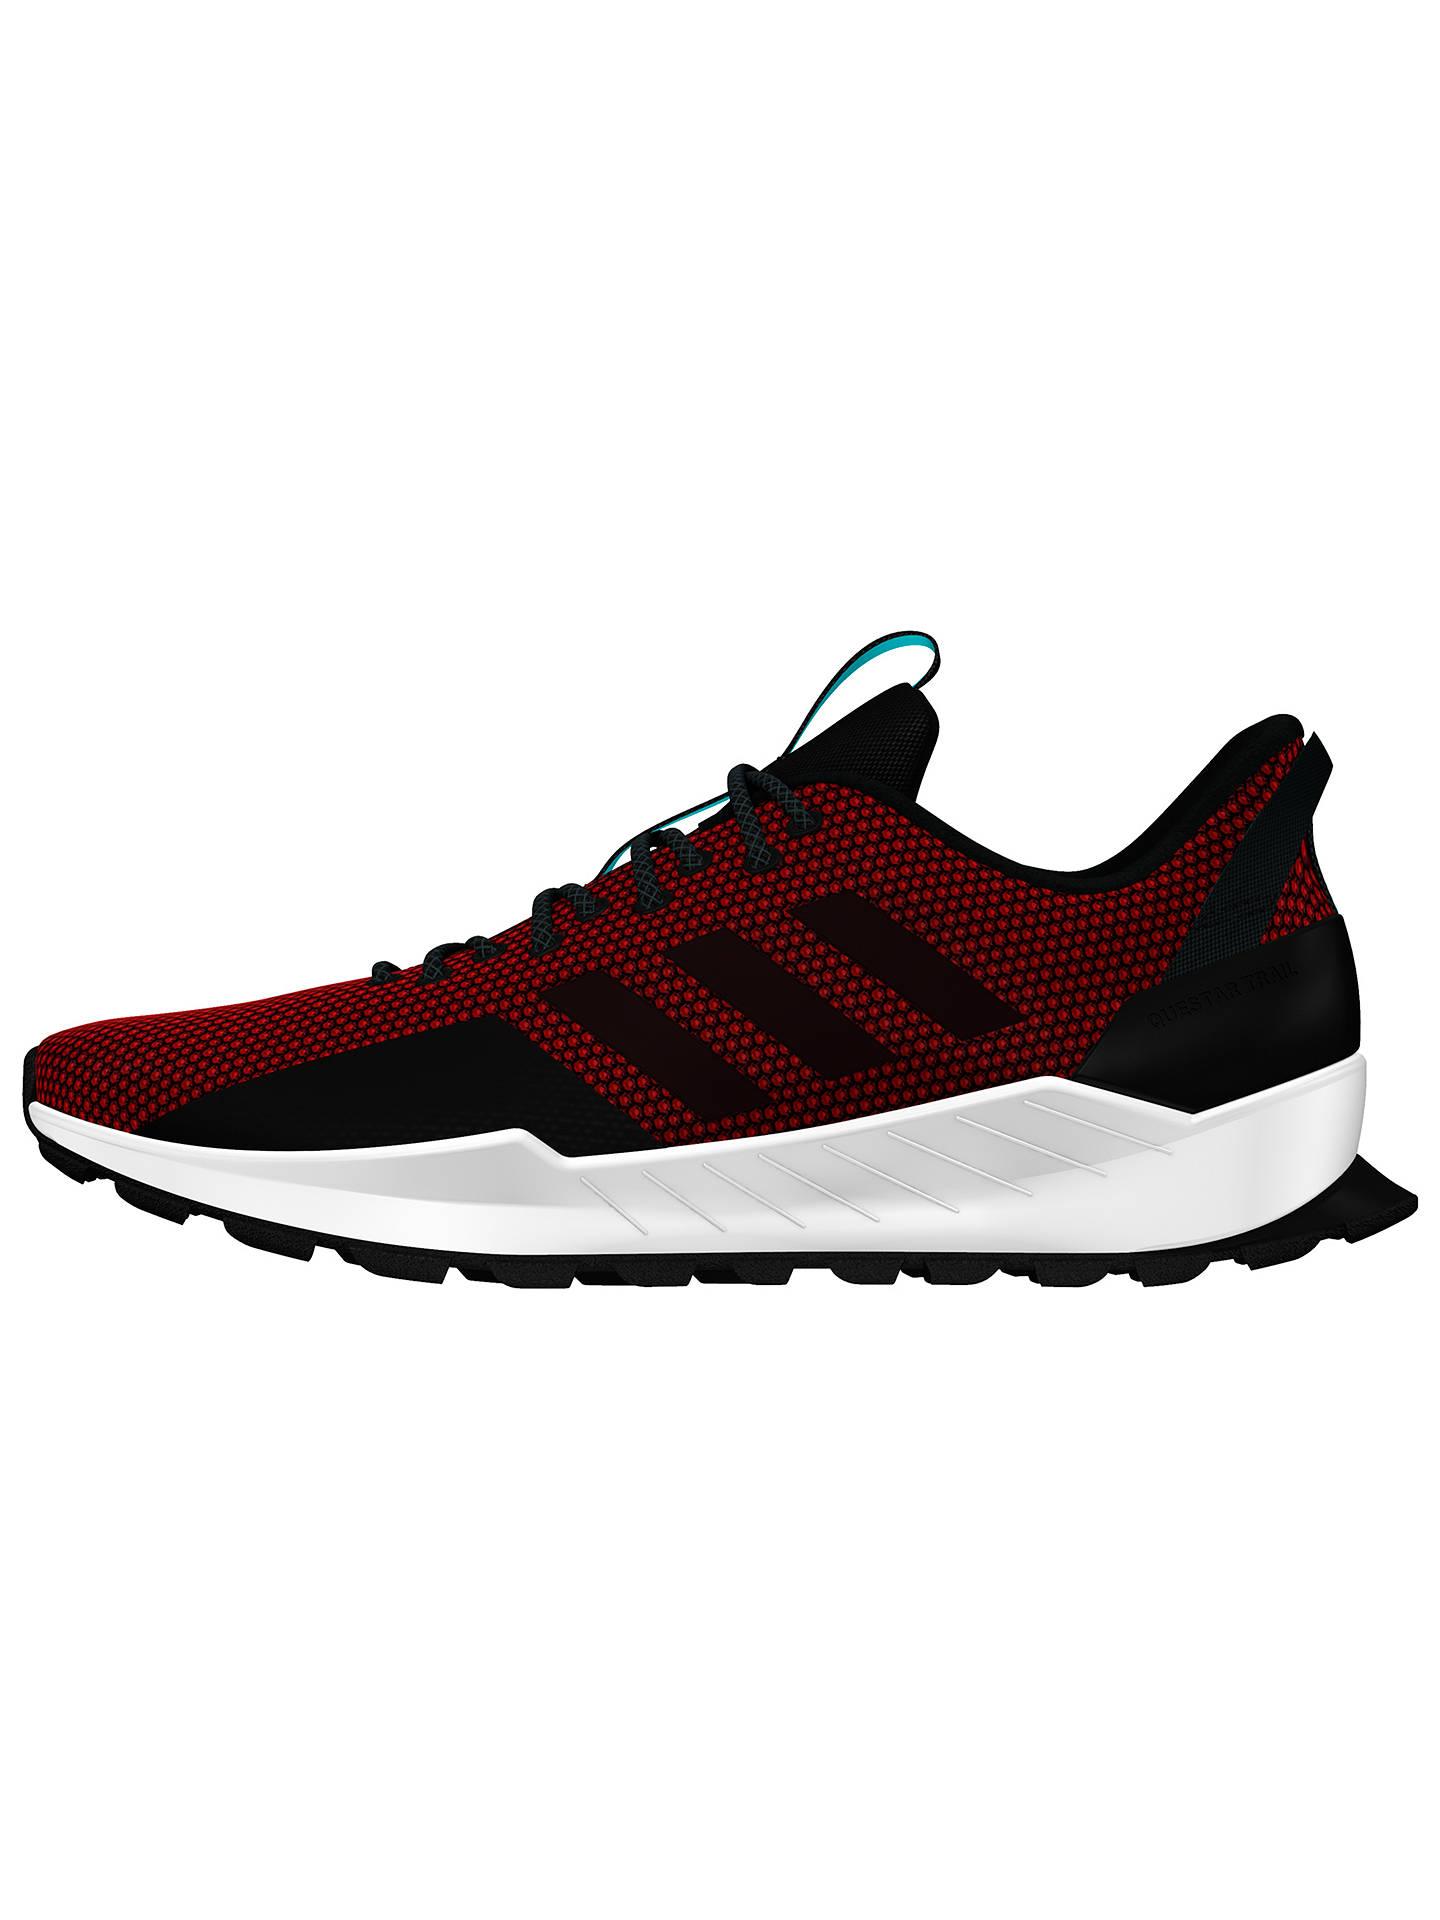 ... Buyadidas Questar Trail Men s Running Shoes 4e771e780